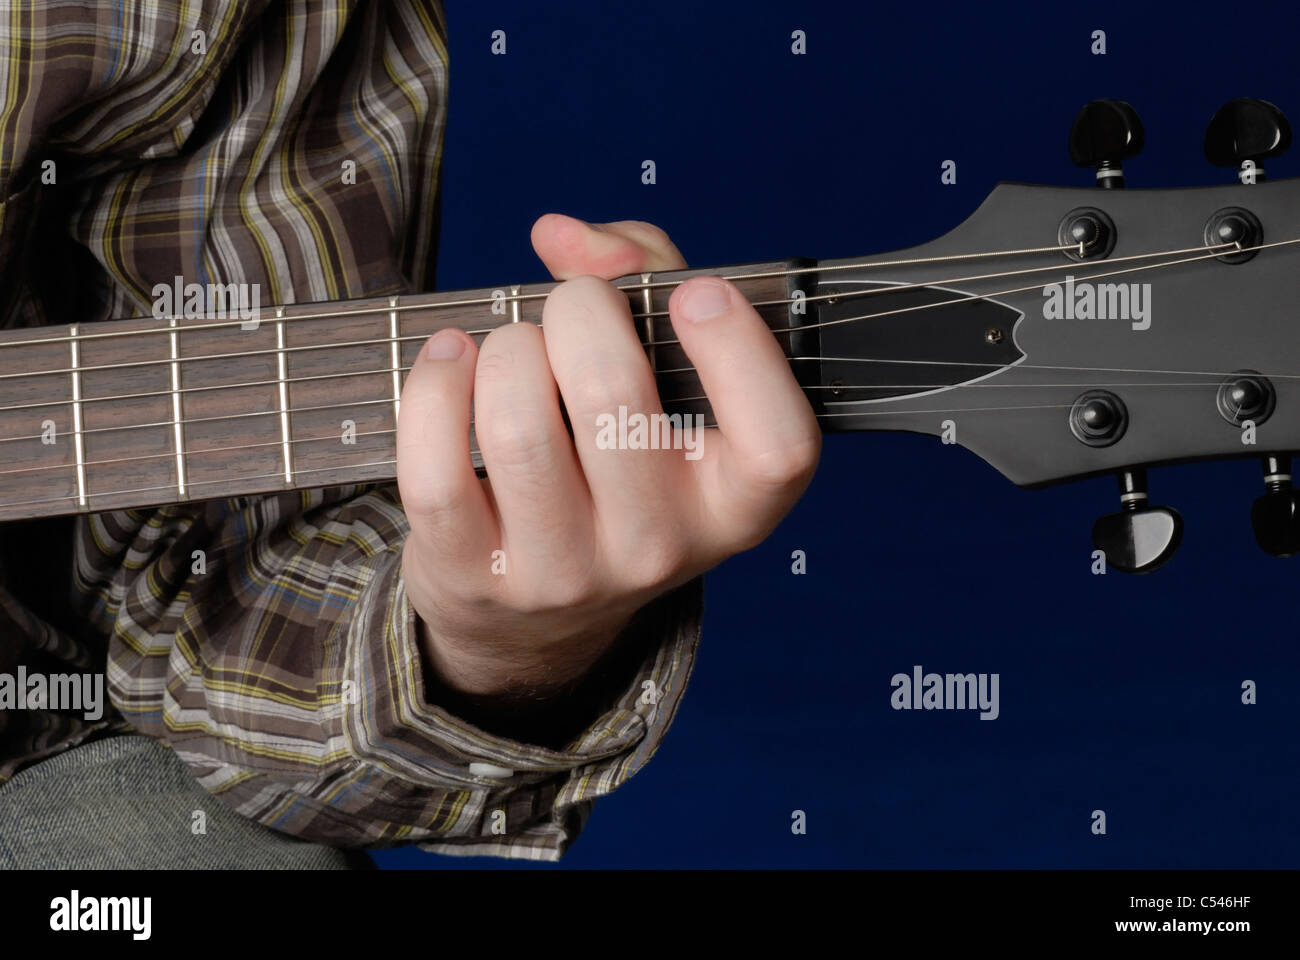 E Minor Chord Stock Photos E Minor Chord Stock Images Alamy